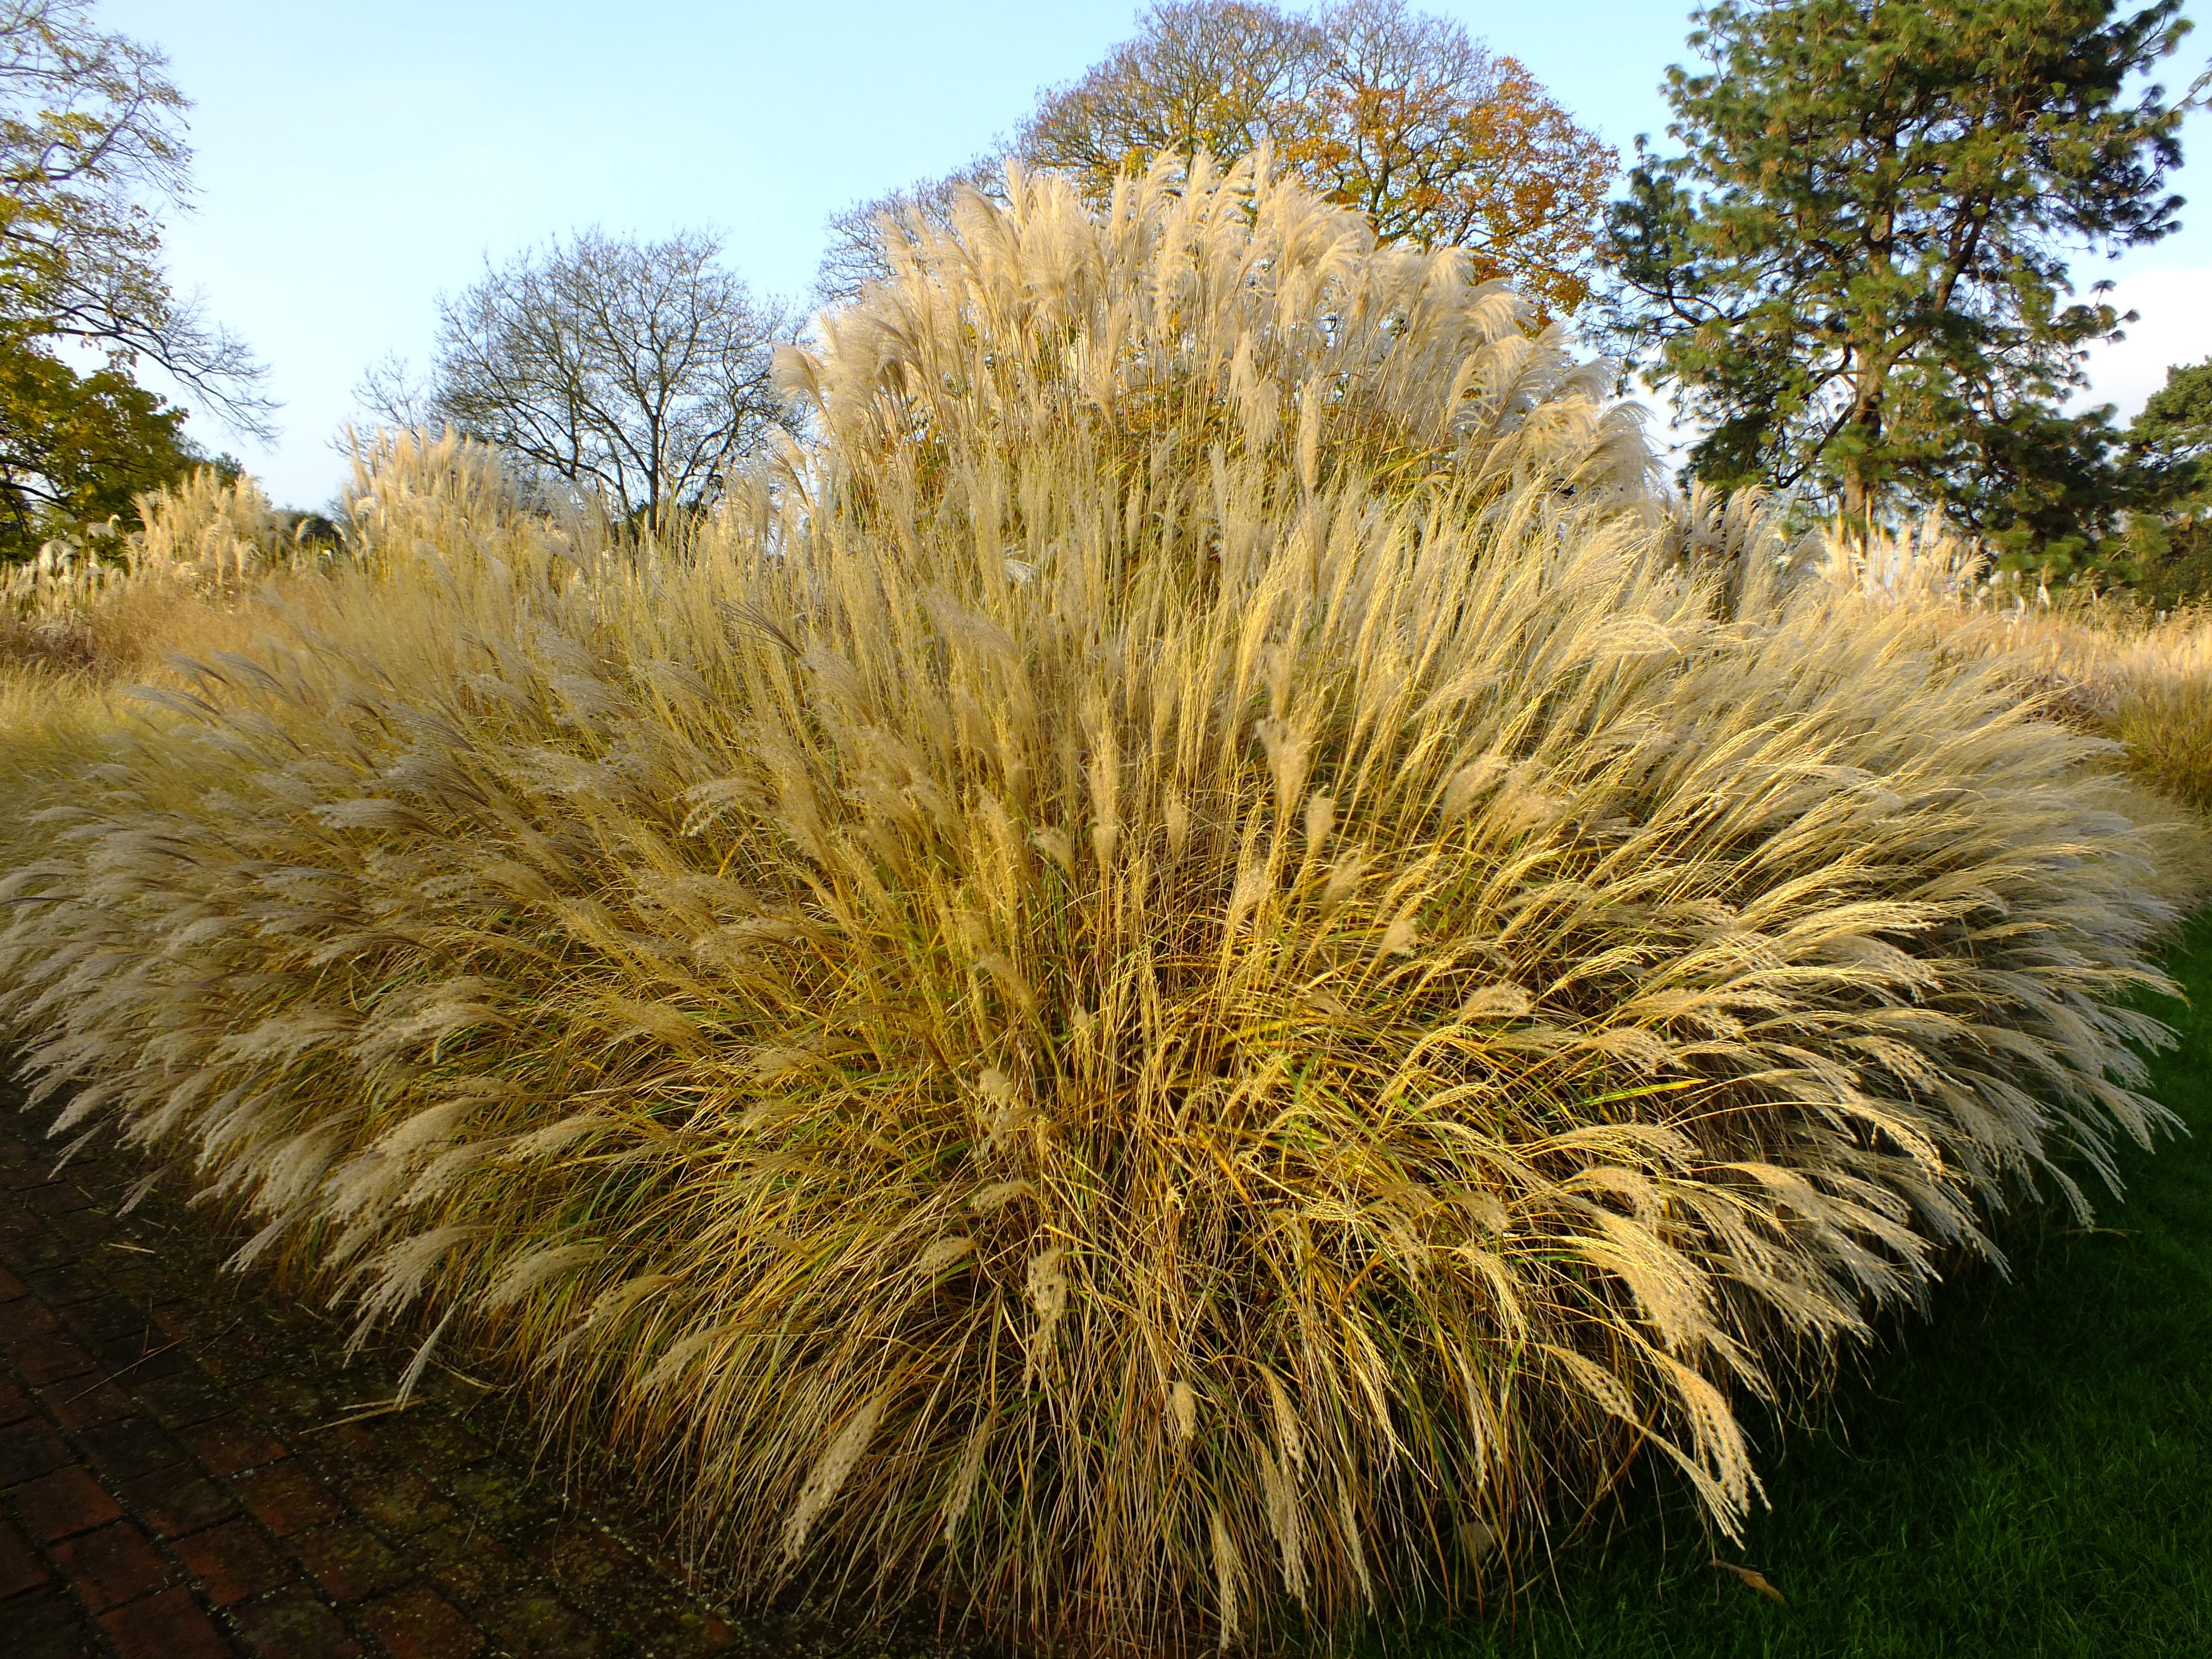 Golden brown, texture like sun – the Grass Borders at Kew Gardens ...